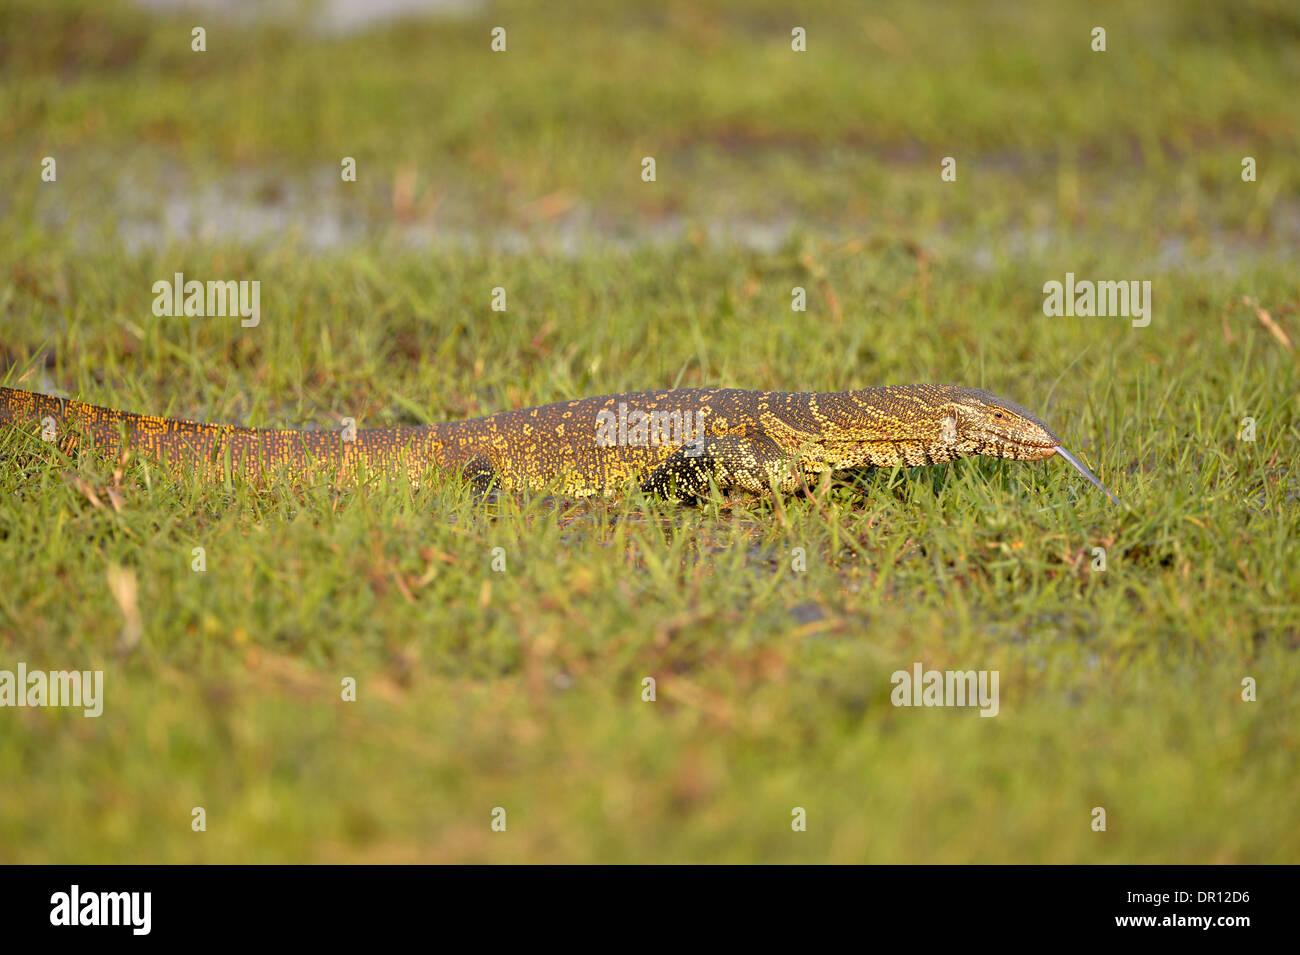 Varan du Nil (Varanus niloticus) marcher dans l'herbe, gorgés d'witrh langue étendu, Kafue National Park, Zambie, S Photo Stock